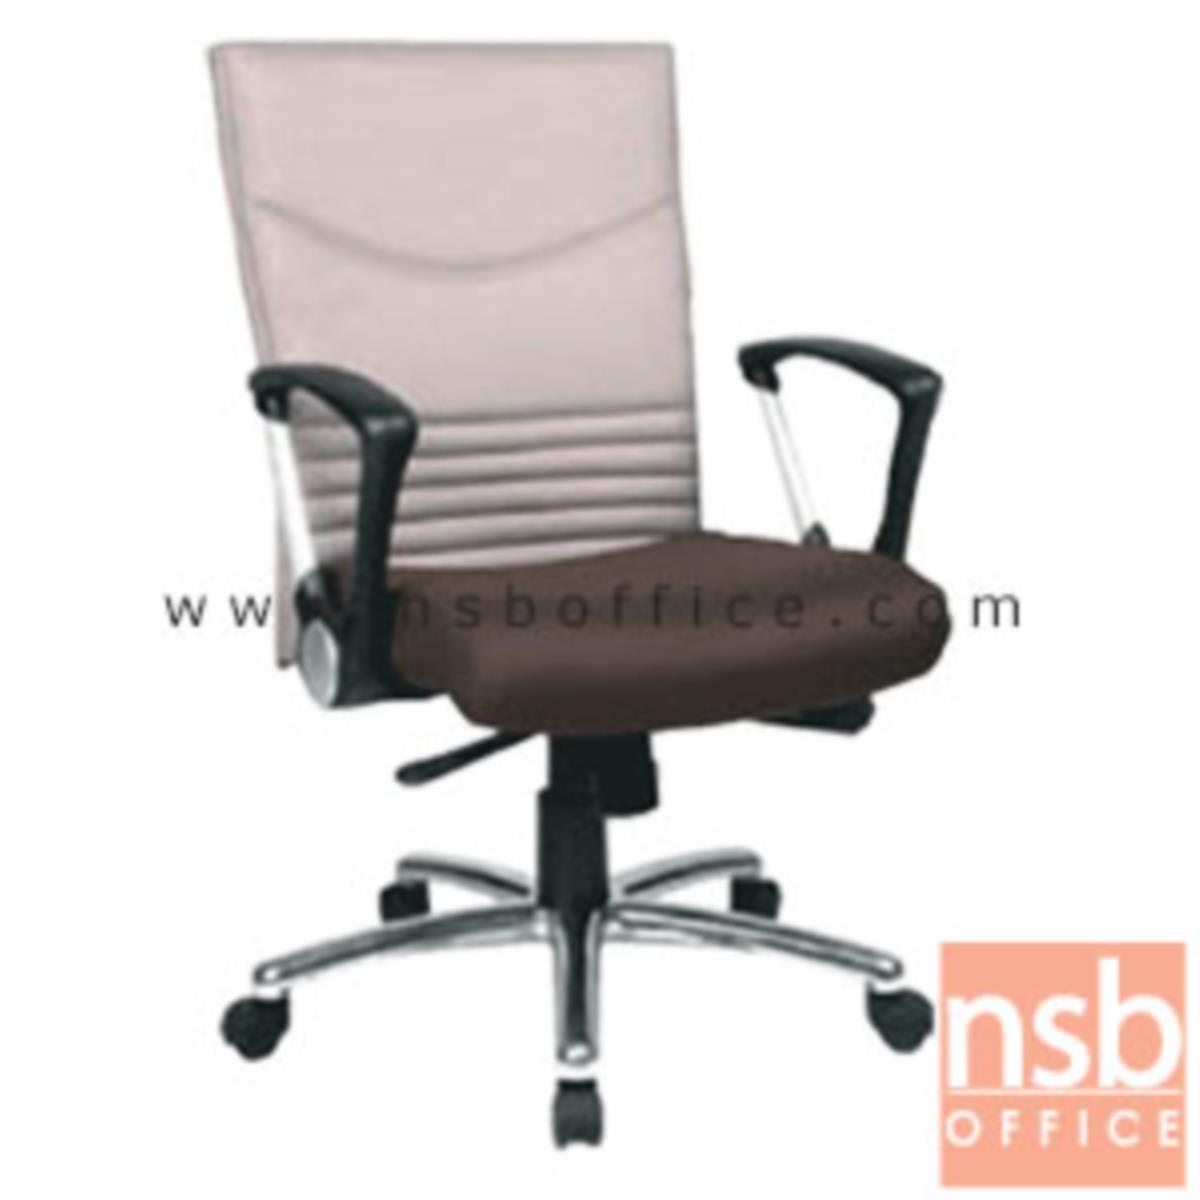 B26A060:เก้าอี้หัวหน้างาน รุ่น VT-35742-I  โช๊คแก๊ส มีก้อนโยก ขาอลูมิเนียม